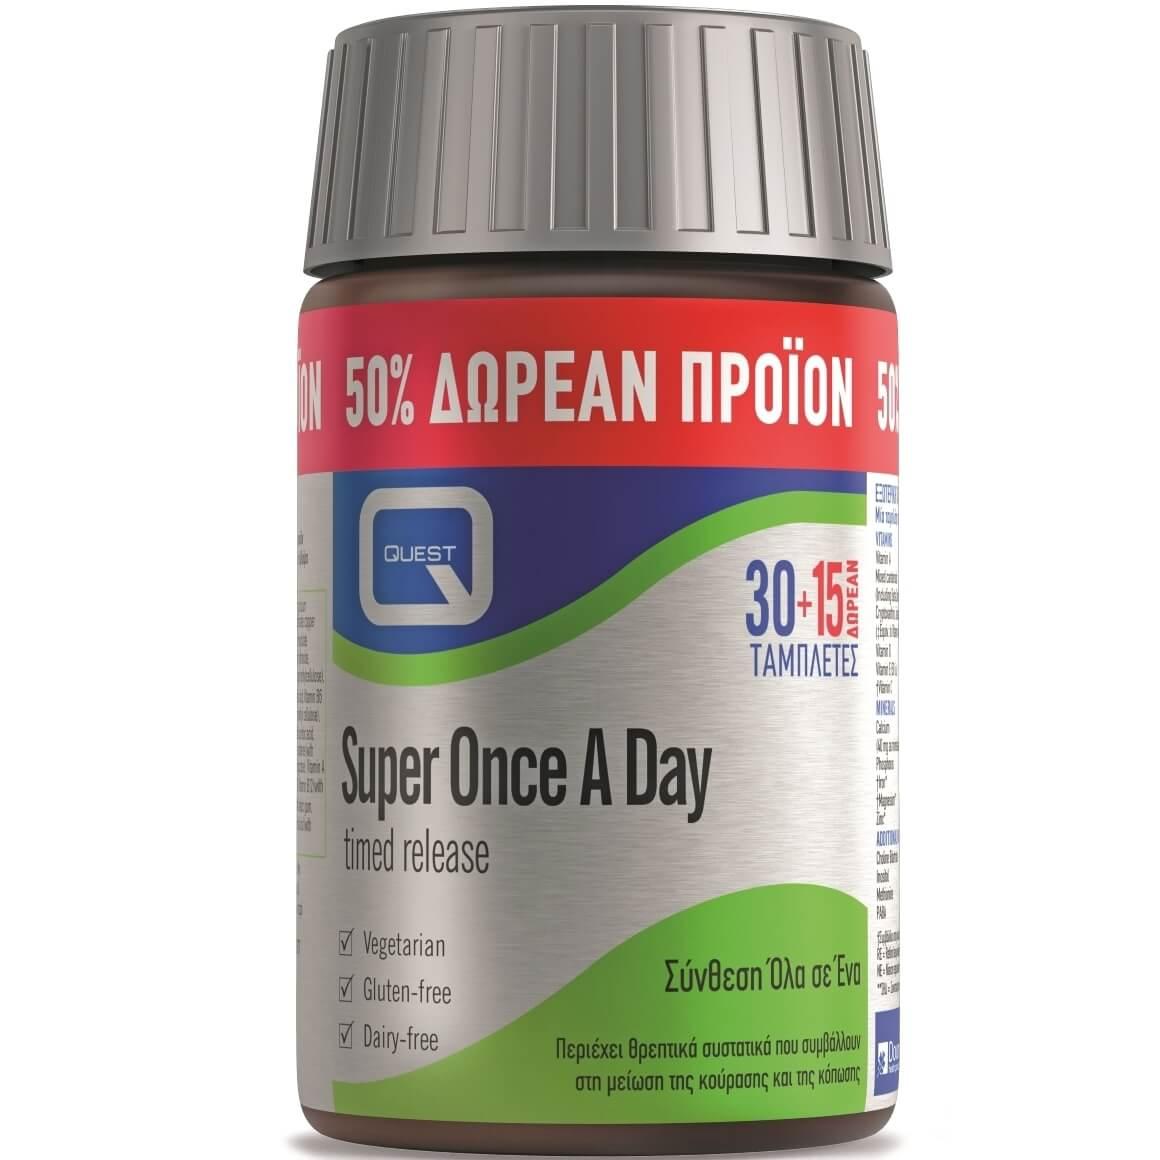 Quest Super Once a Day Timed Release Συμπλήρωμα Διατροφής για Καλή Φυσική Κατάσταση30+15 Tαμπλέτες Promo 50% Δωρεάν Προϊόν